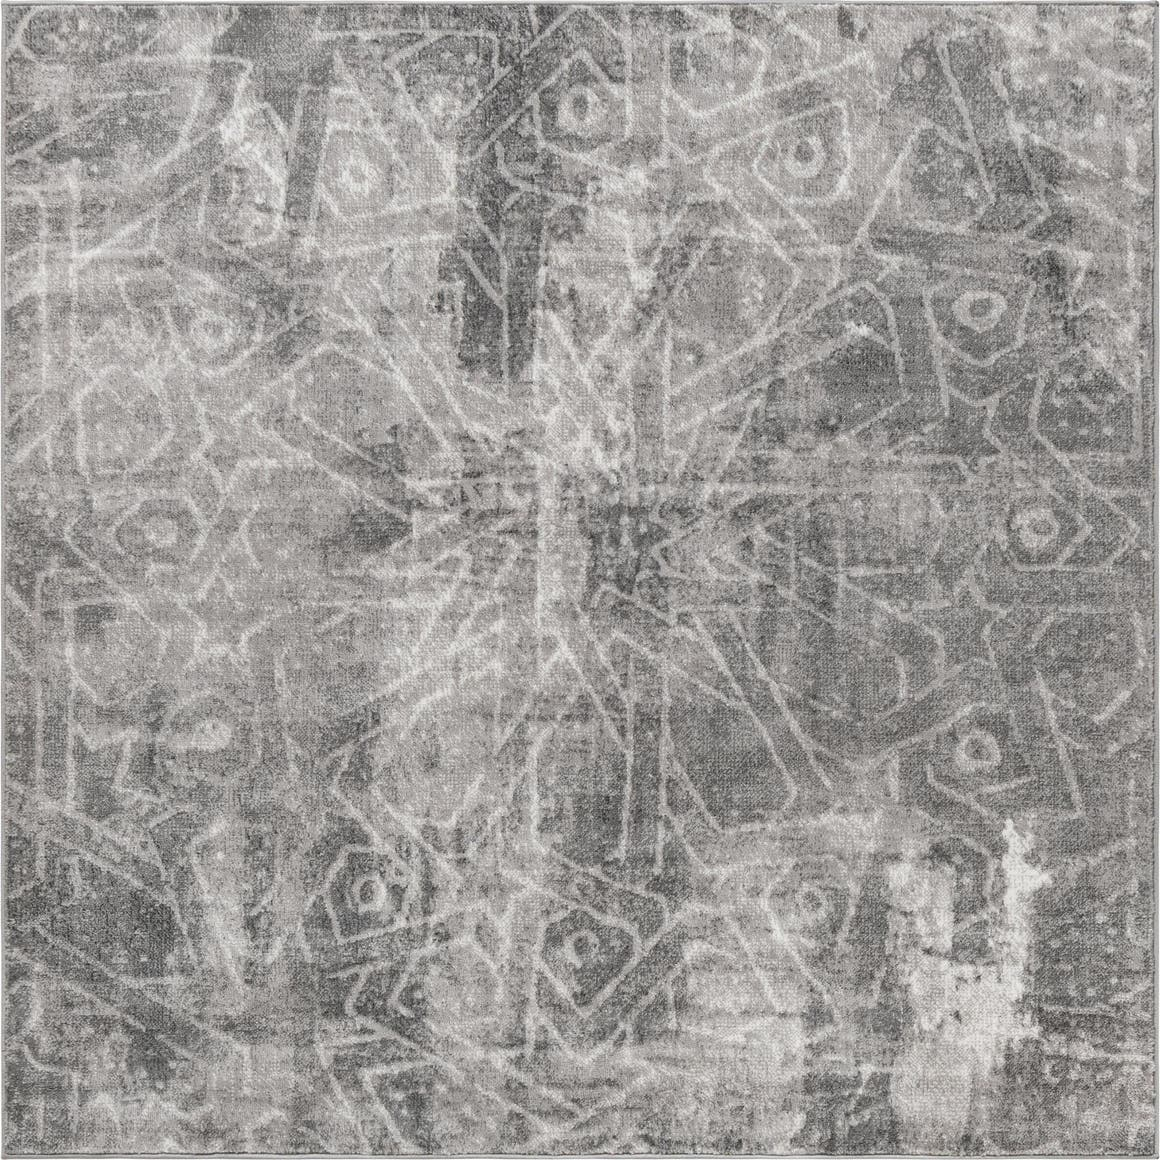 6' x 6' Monaco Square Rug main image